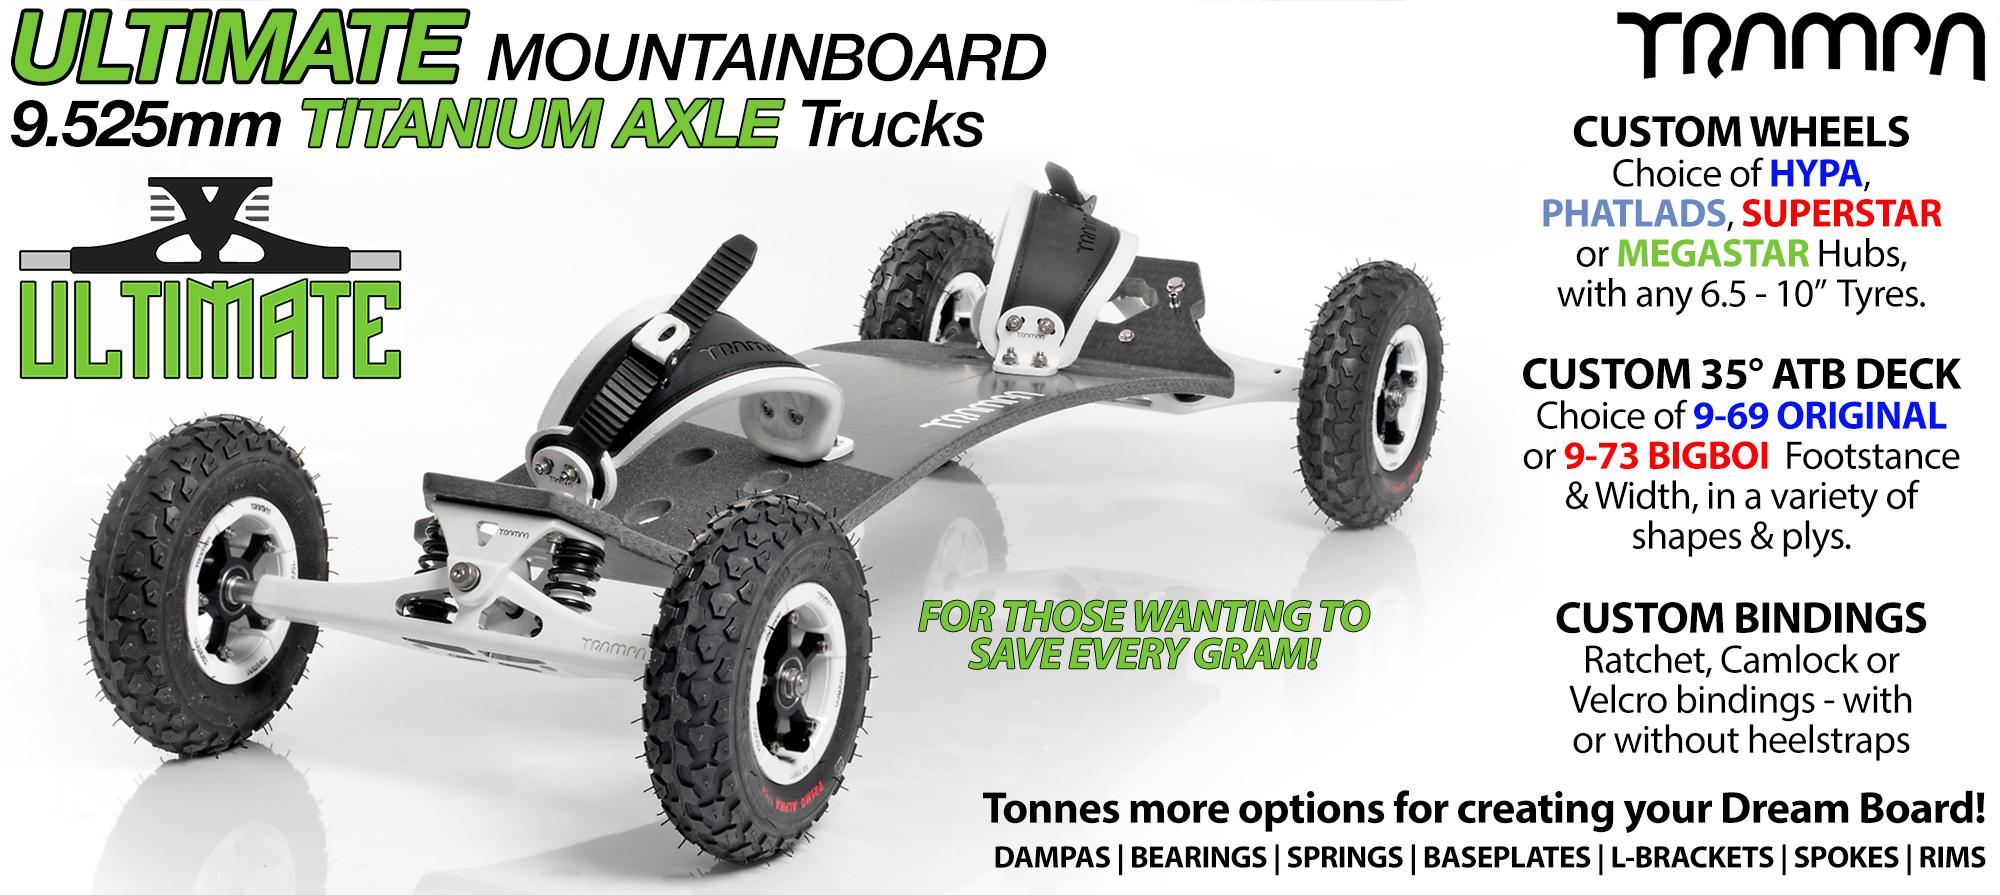 ULTIMATE Mountainboard - 9.525mm TITANIUM Axles